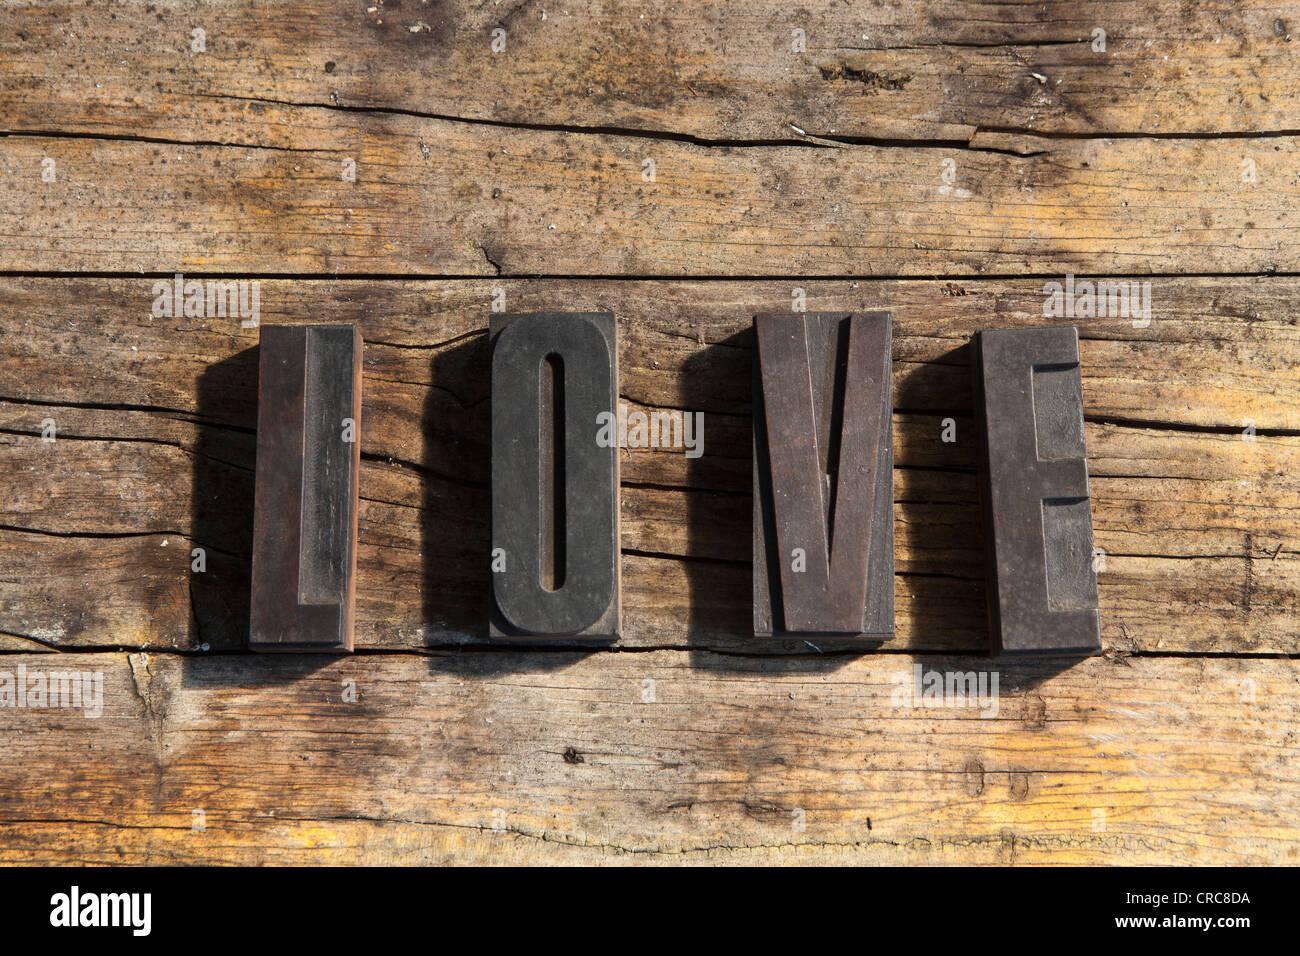 Wooden blocks spelling love - Stock Image